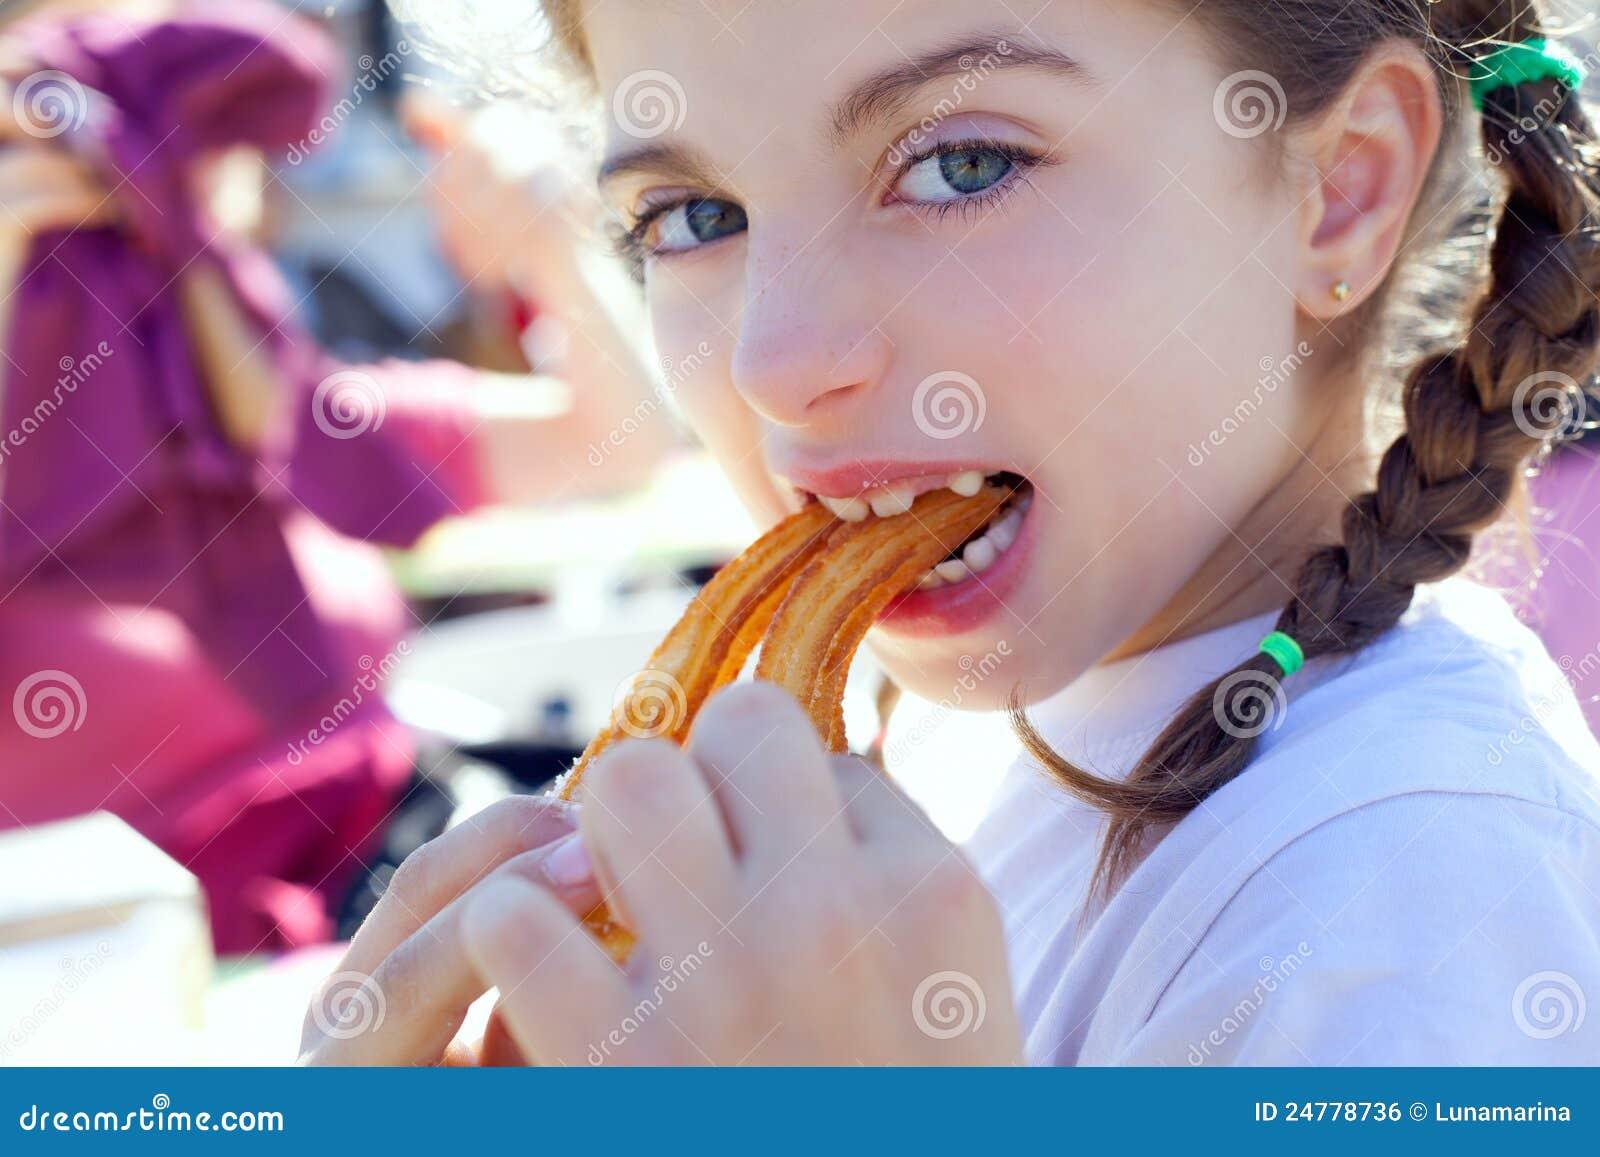 Blue Eyes Little Girl Eating Churros Smiling Royalty Free